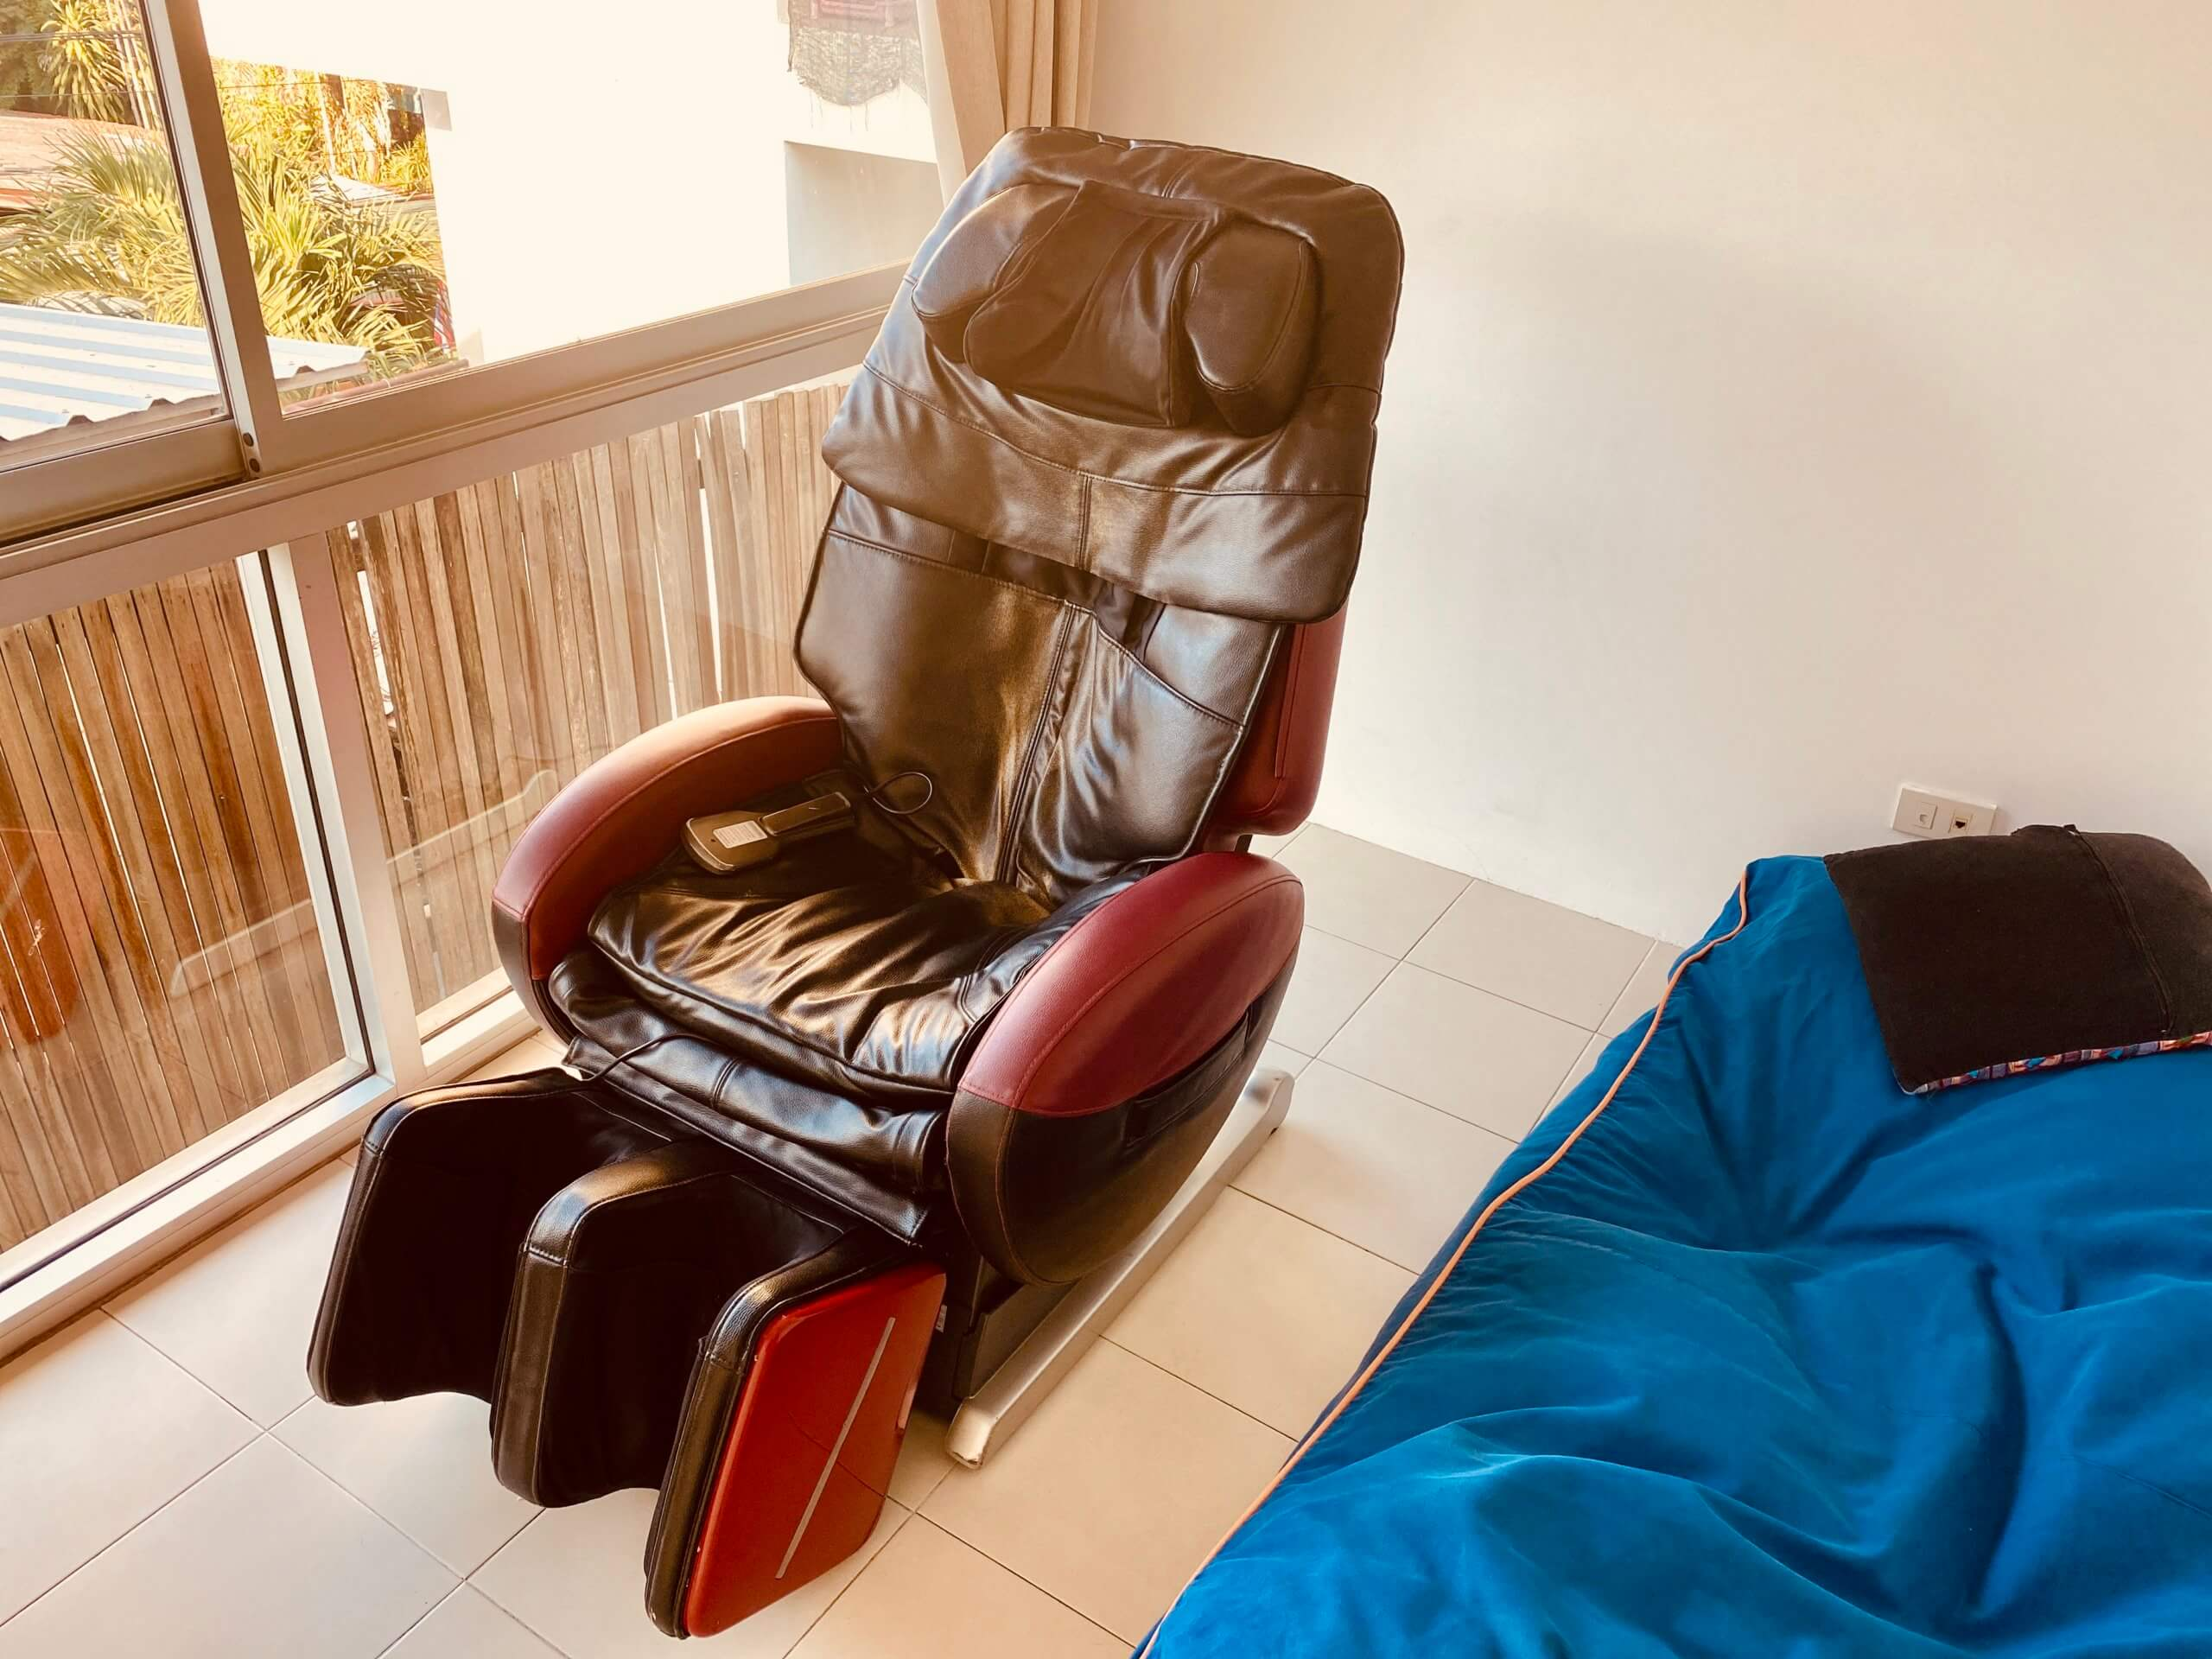 massagesessel bild